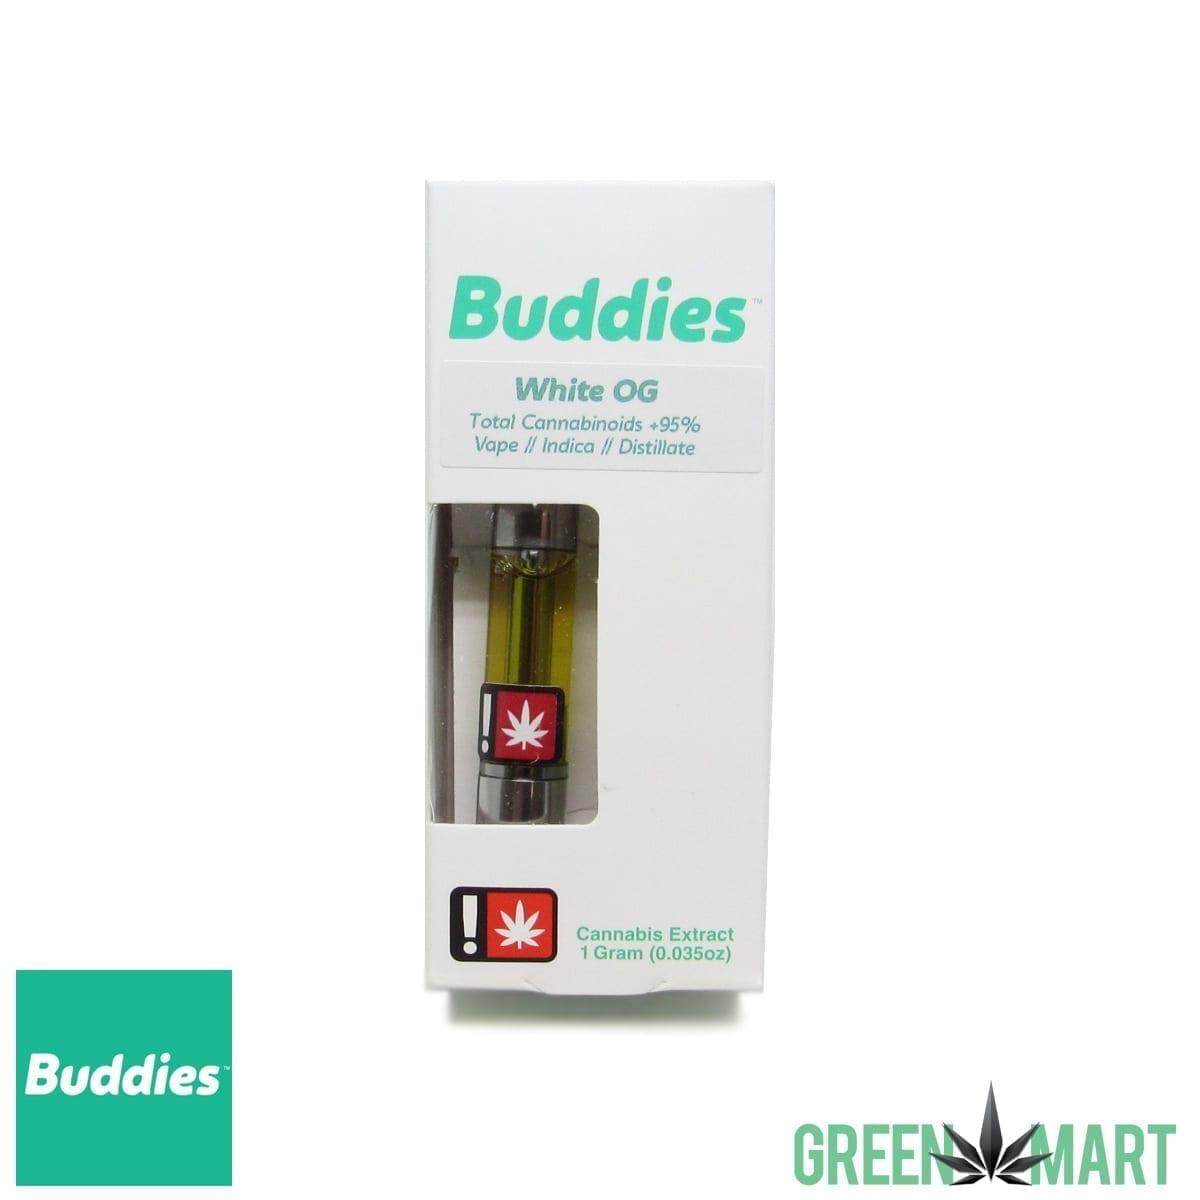 Buddies Brand Distillate Cartridge - White OG